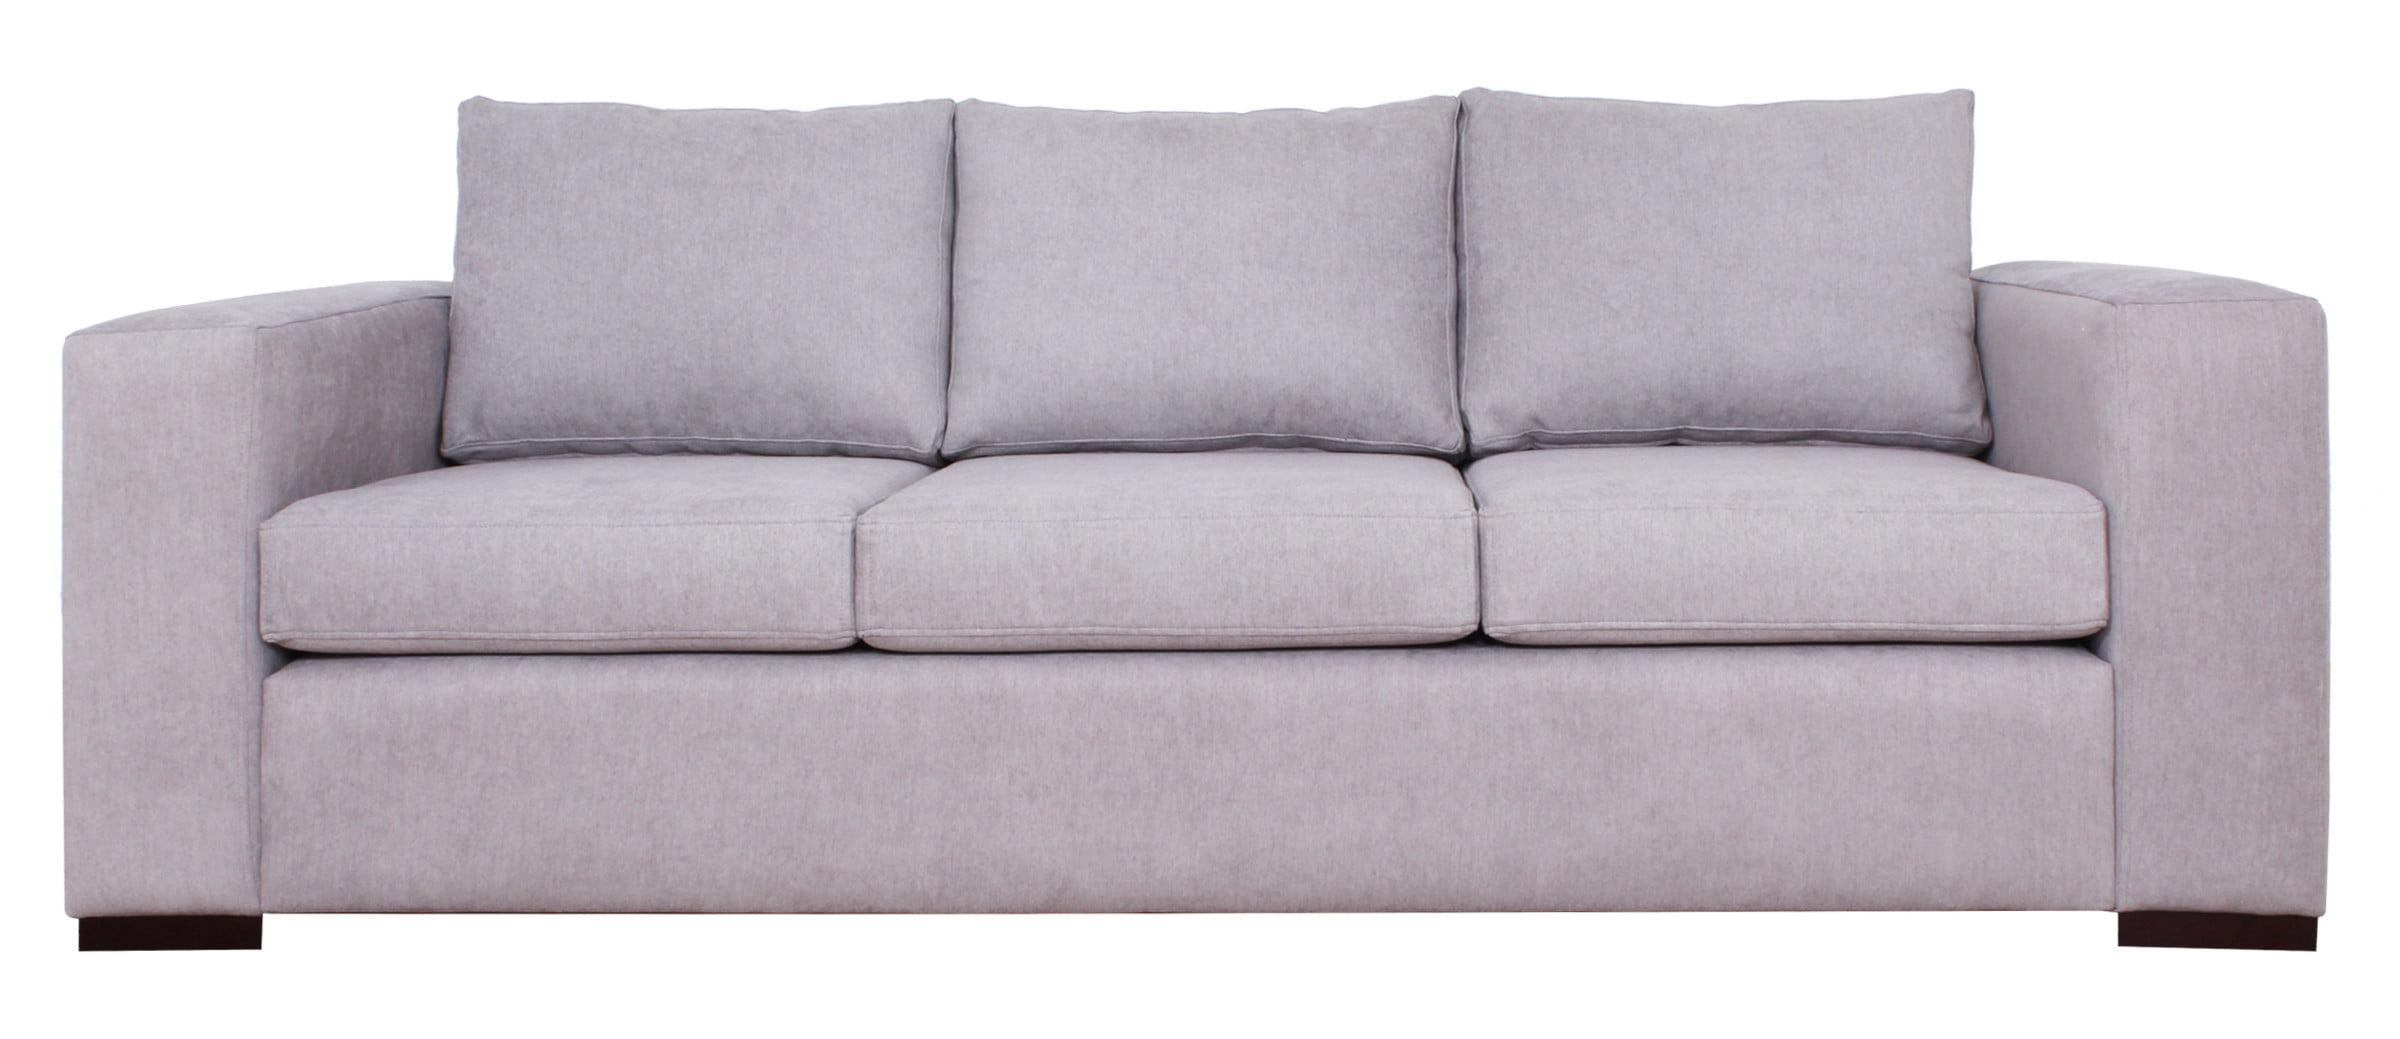 Sofa 3c Personalizado11